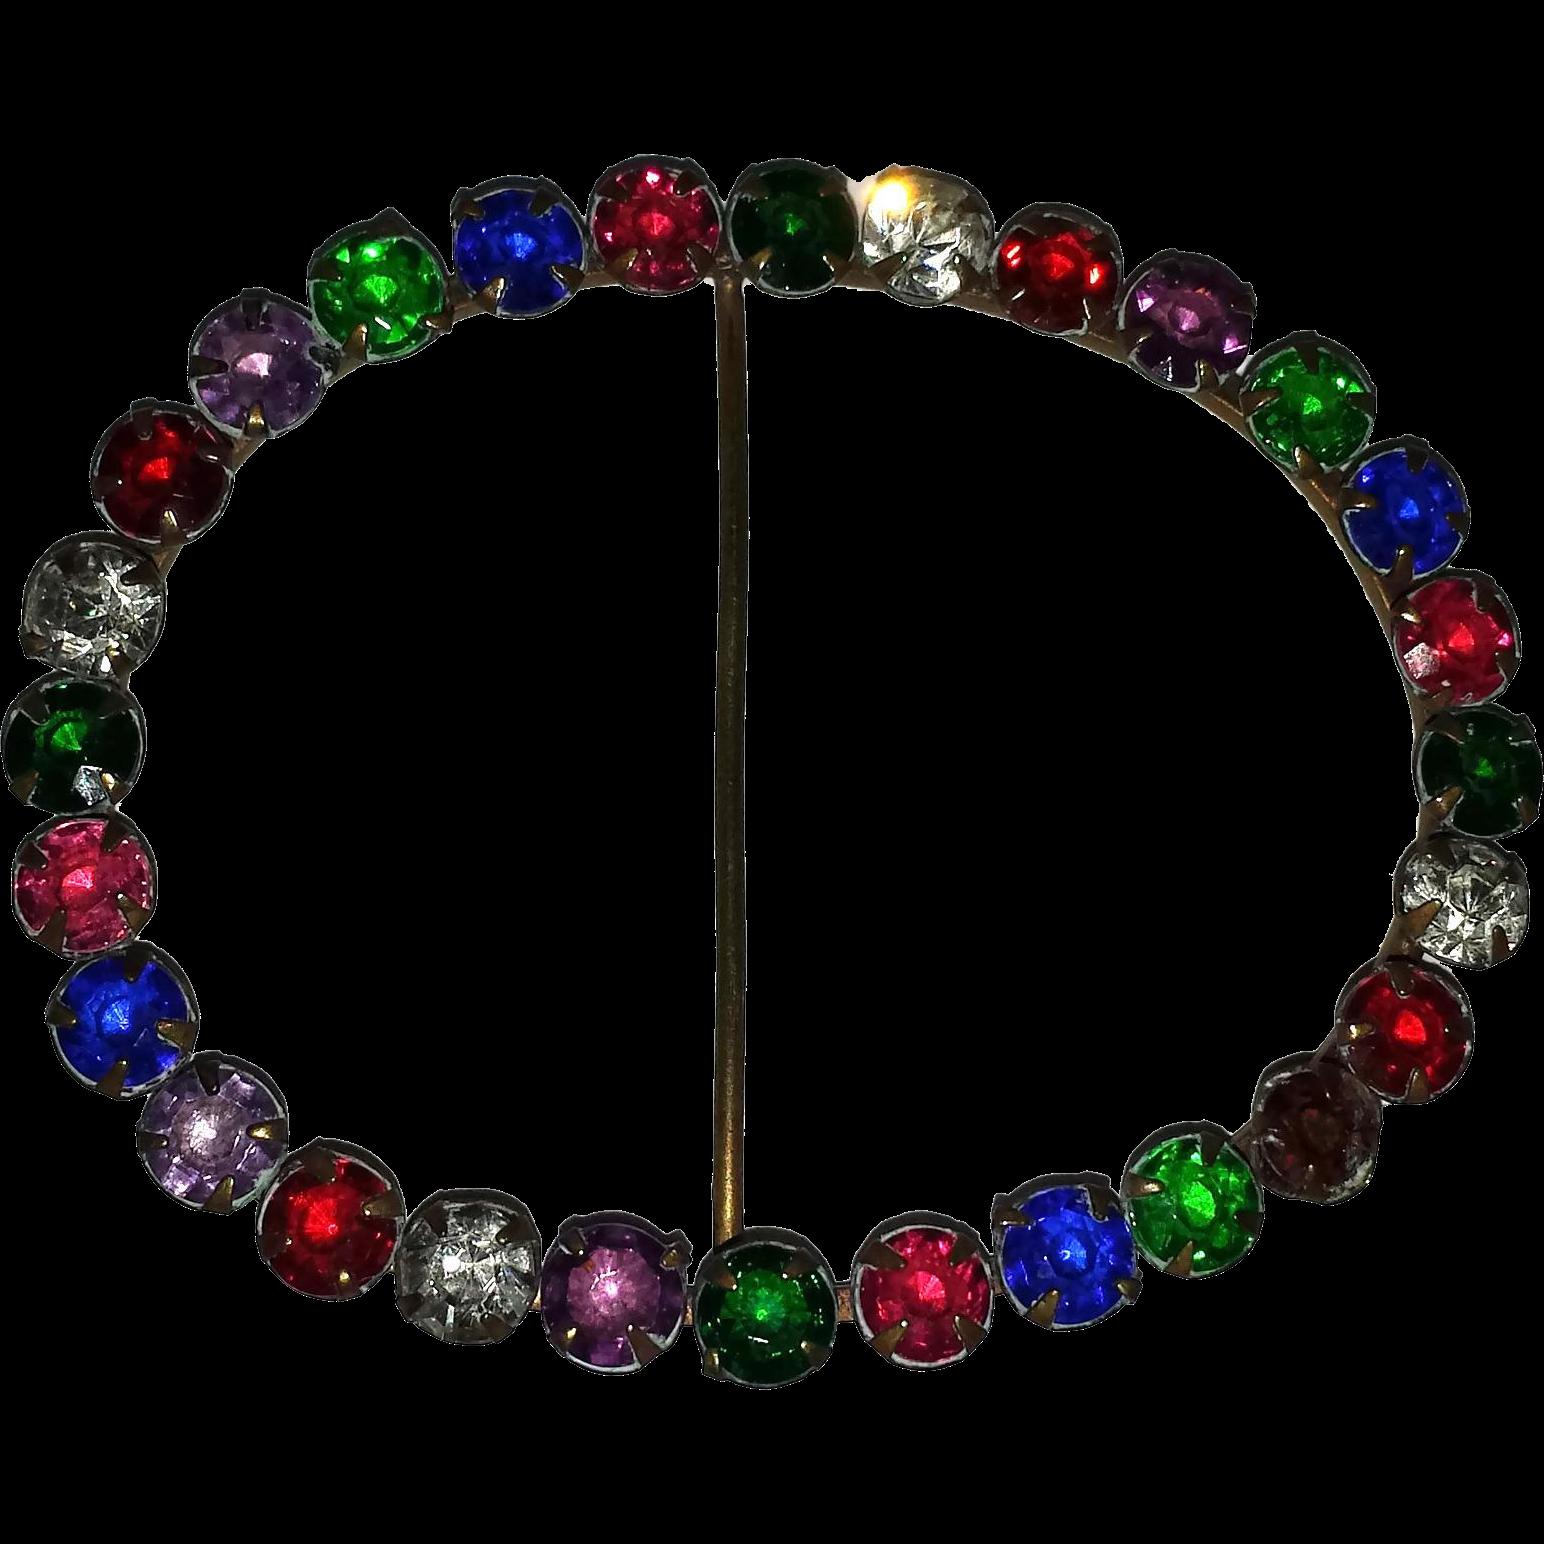 Multi-Colored Rhinestone Art Deco Sash Belt Pin